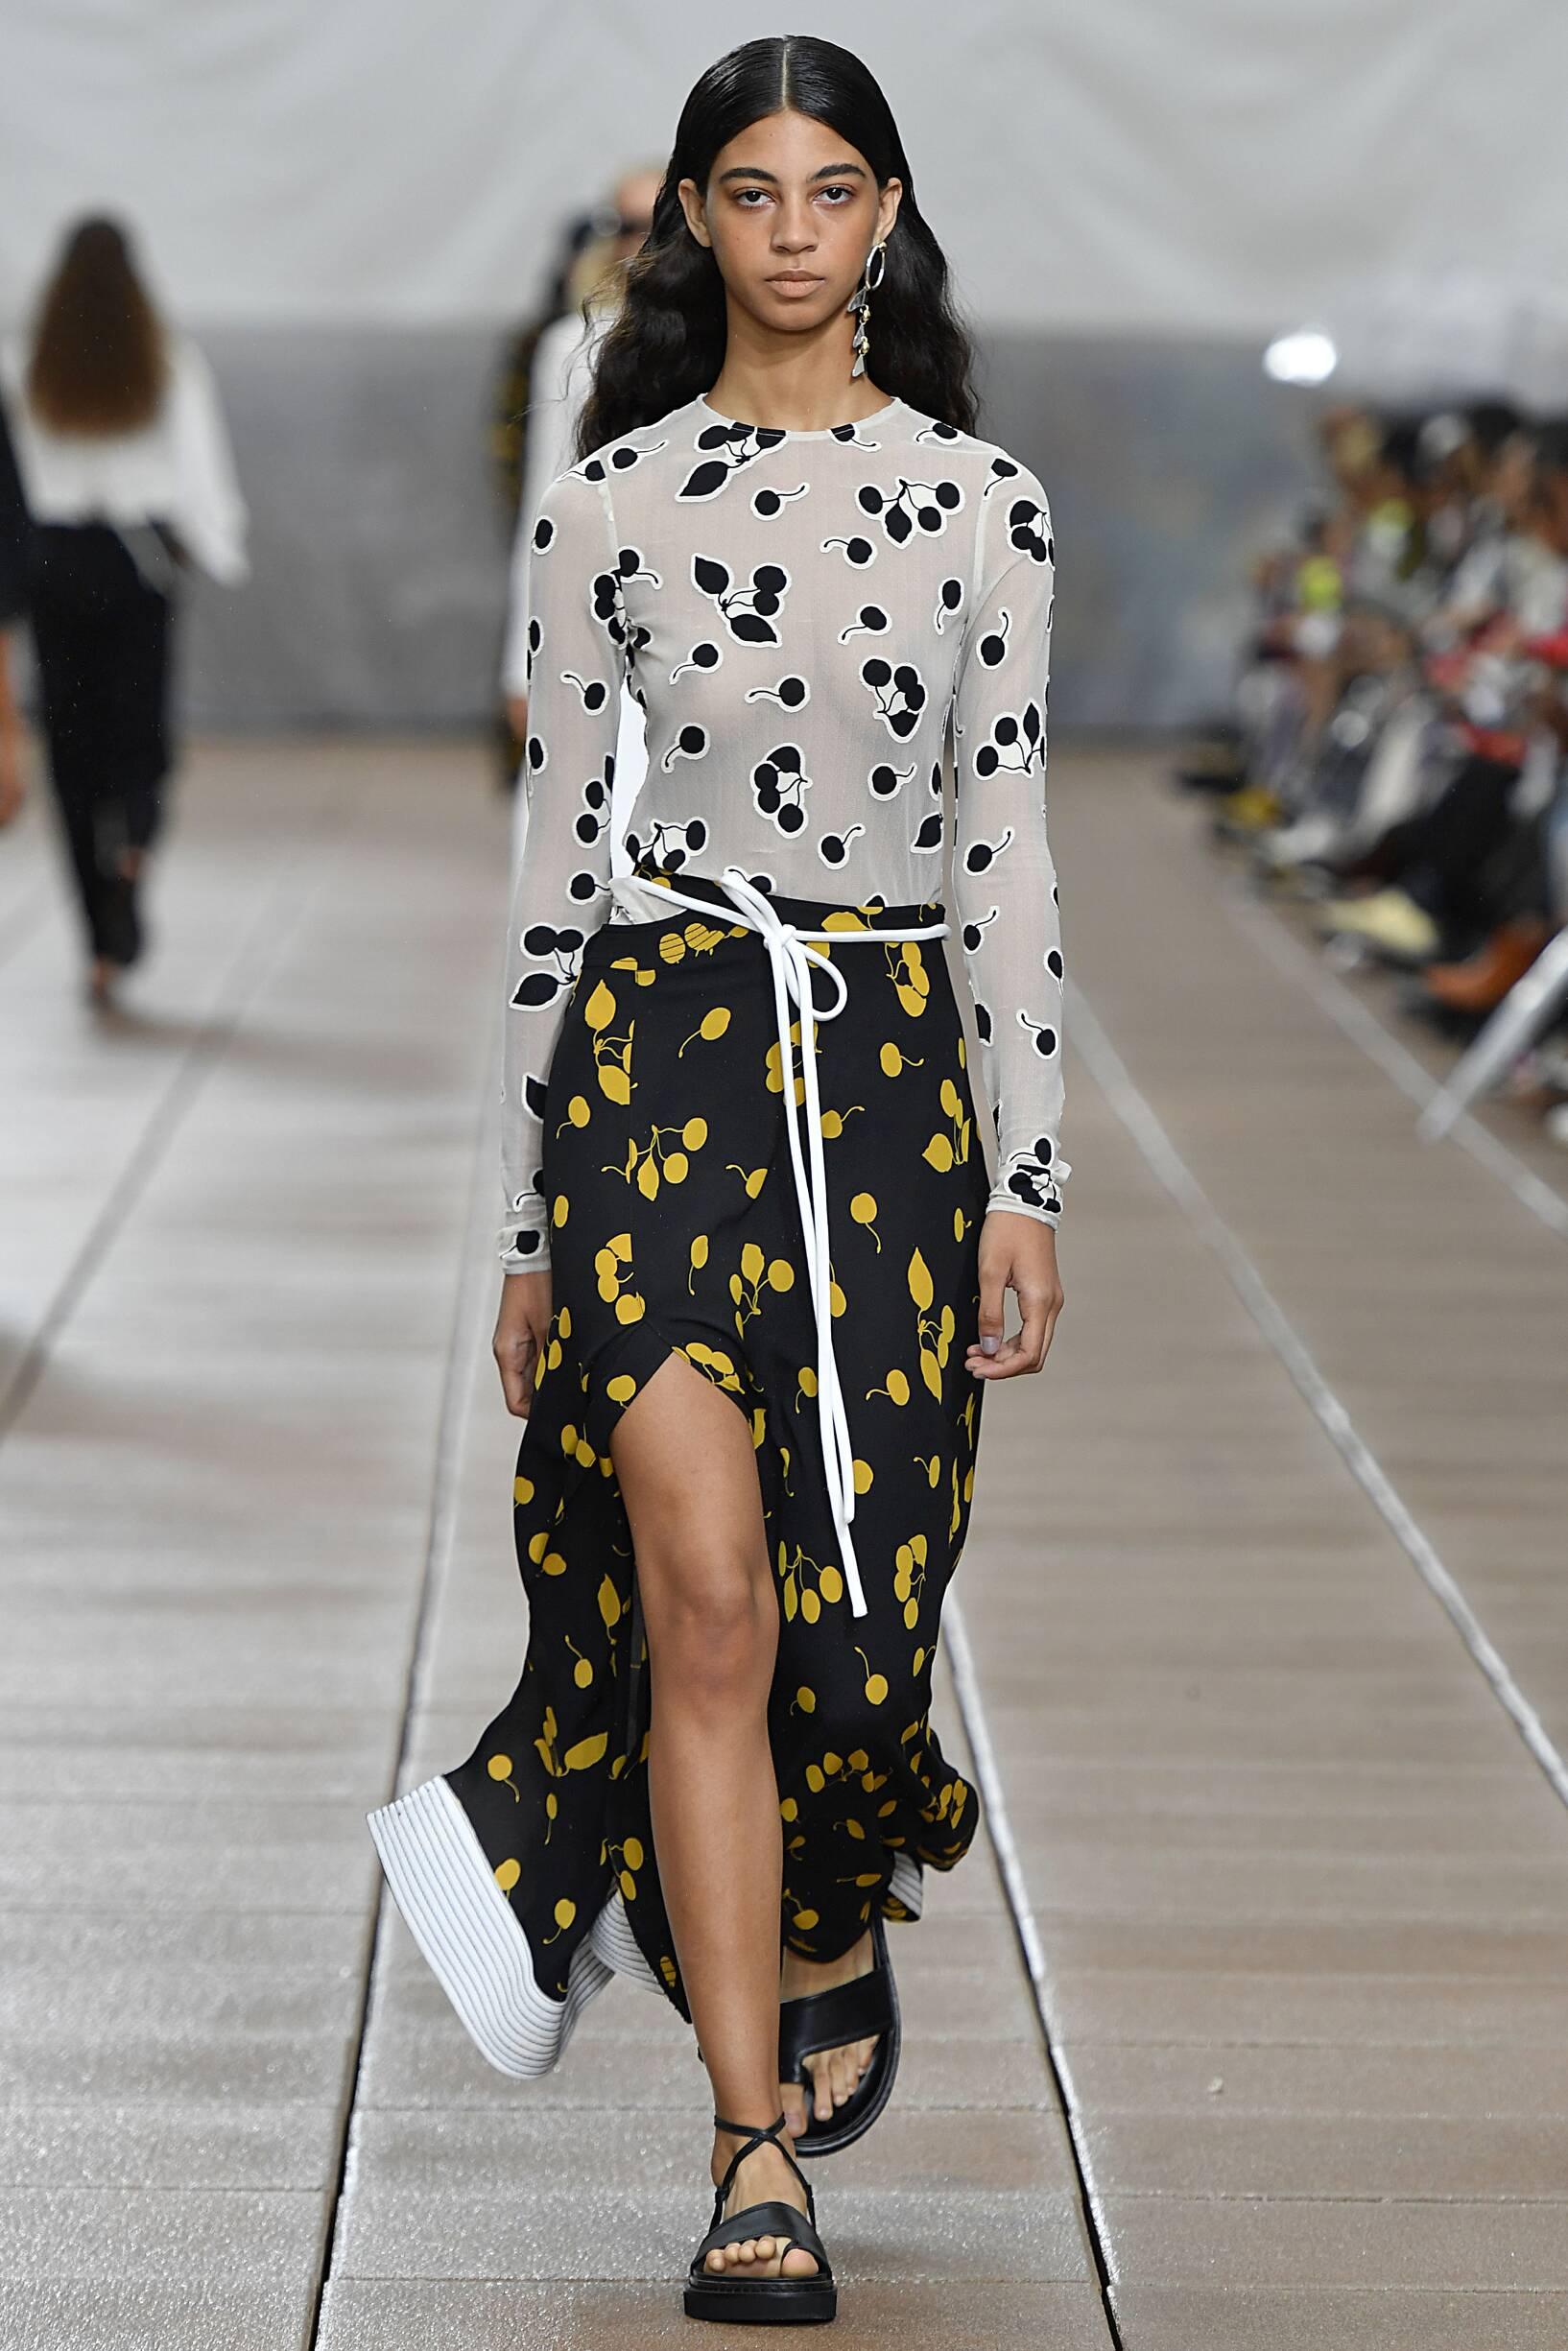 Fashion 2019 Catwalk 3.1 Phillip Lim Summer Woman Collection